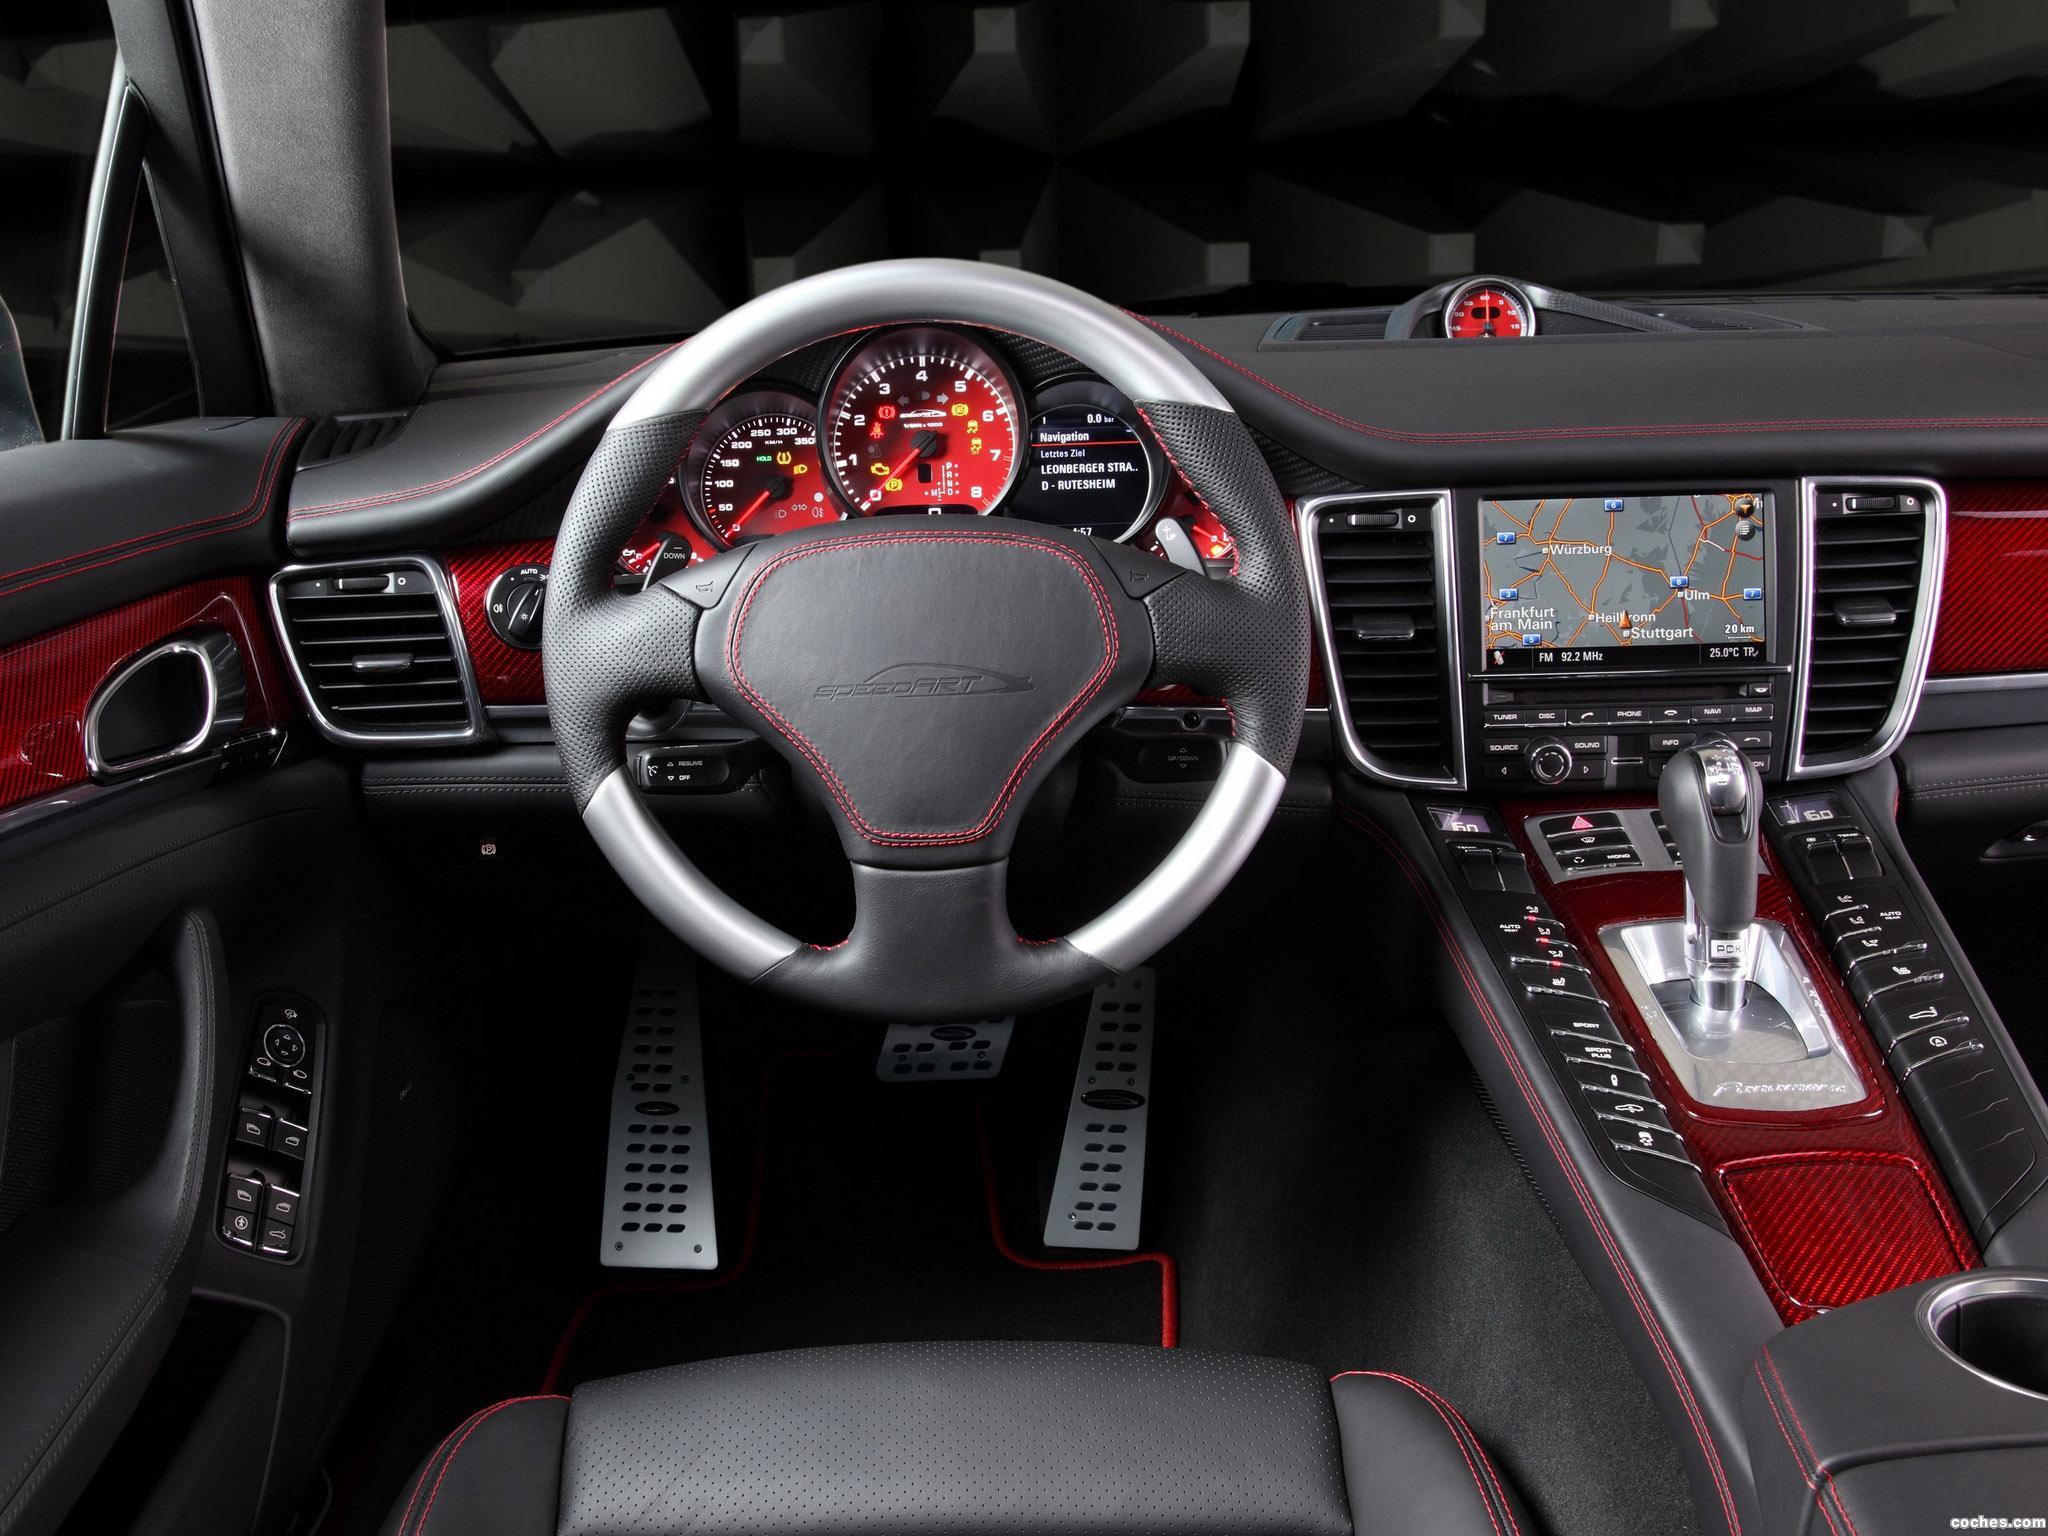 Foto 19 de Speedart Porsche Panamera PS9 650 2009